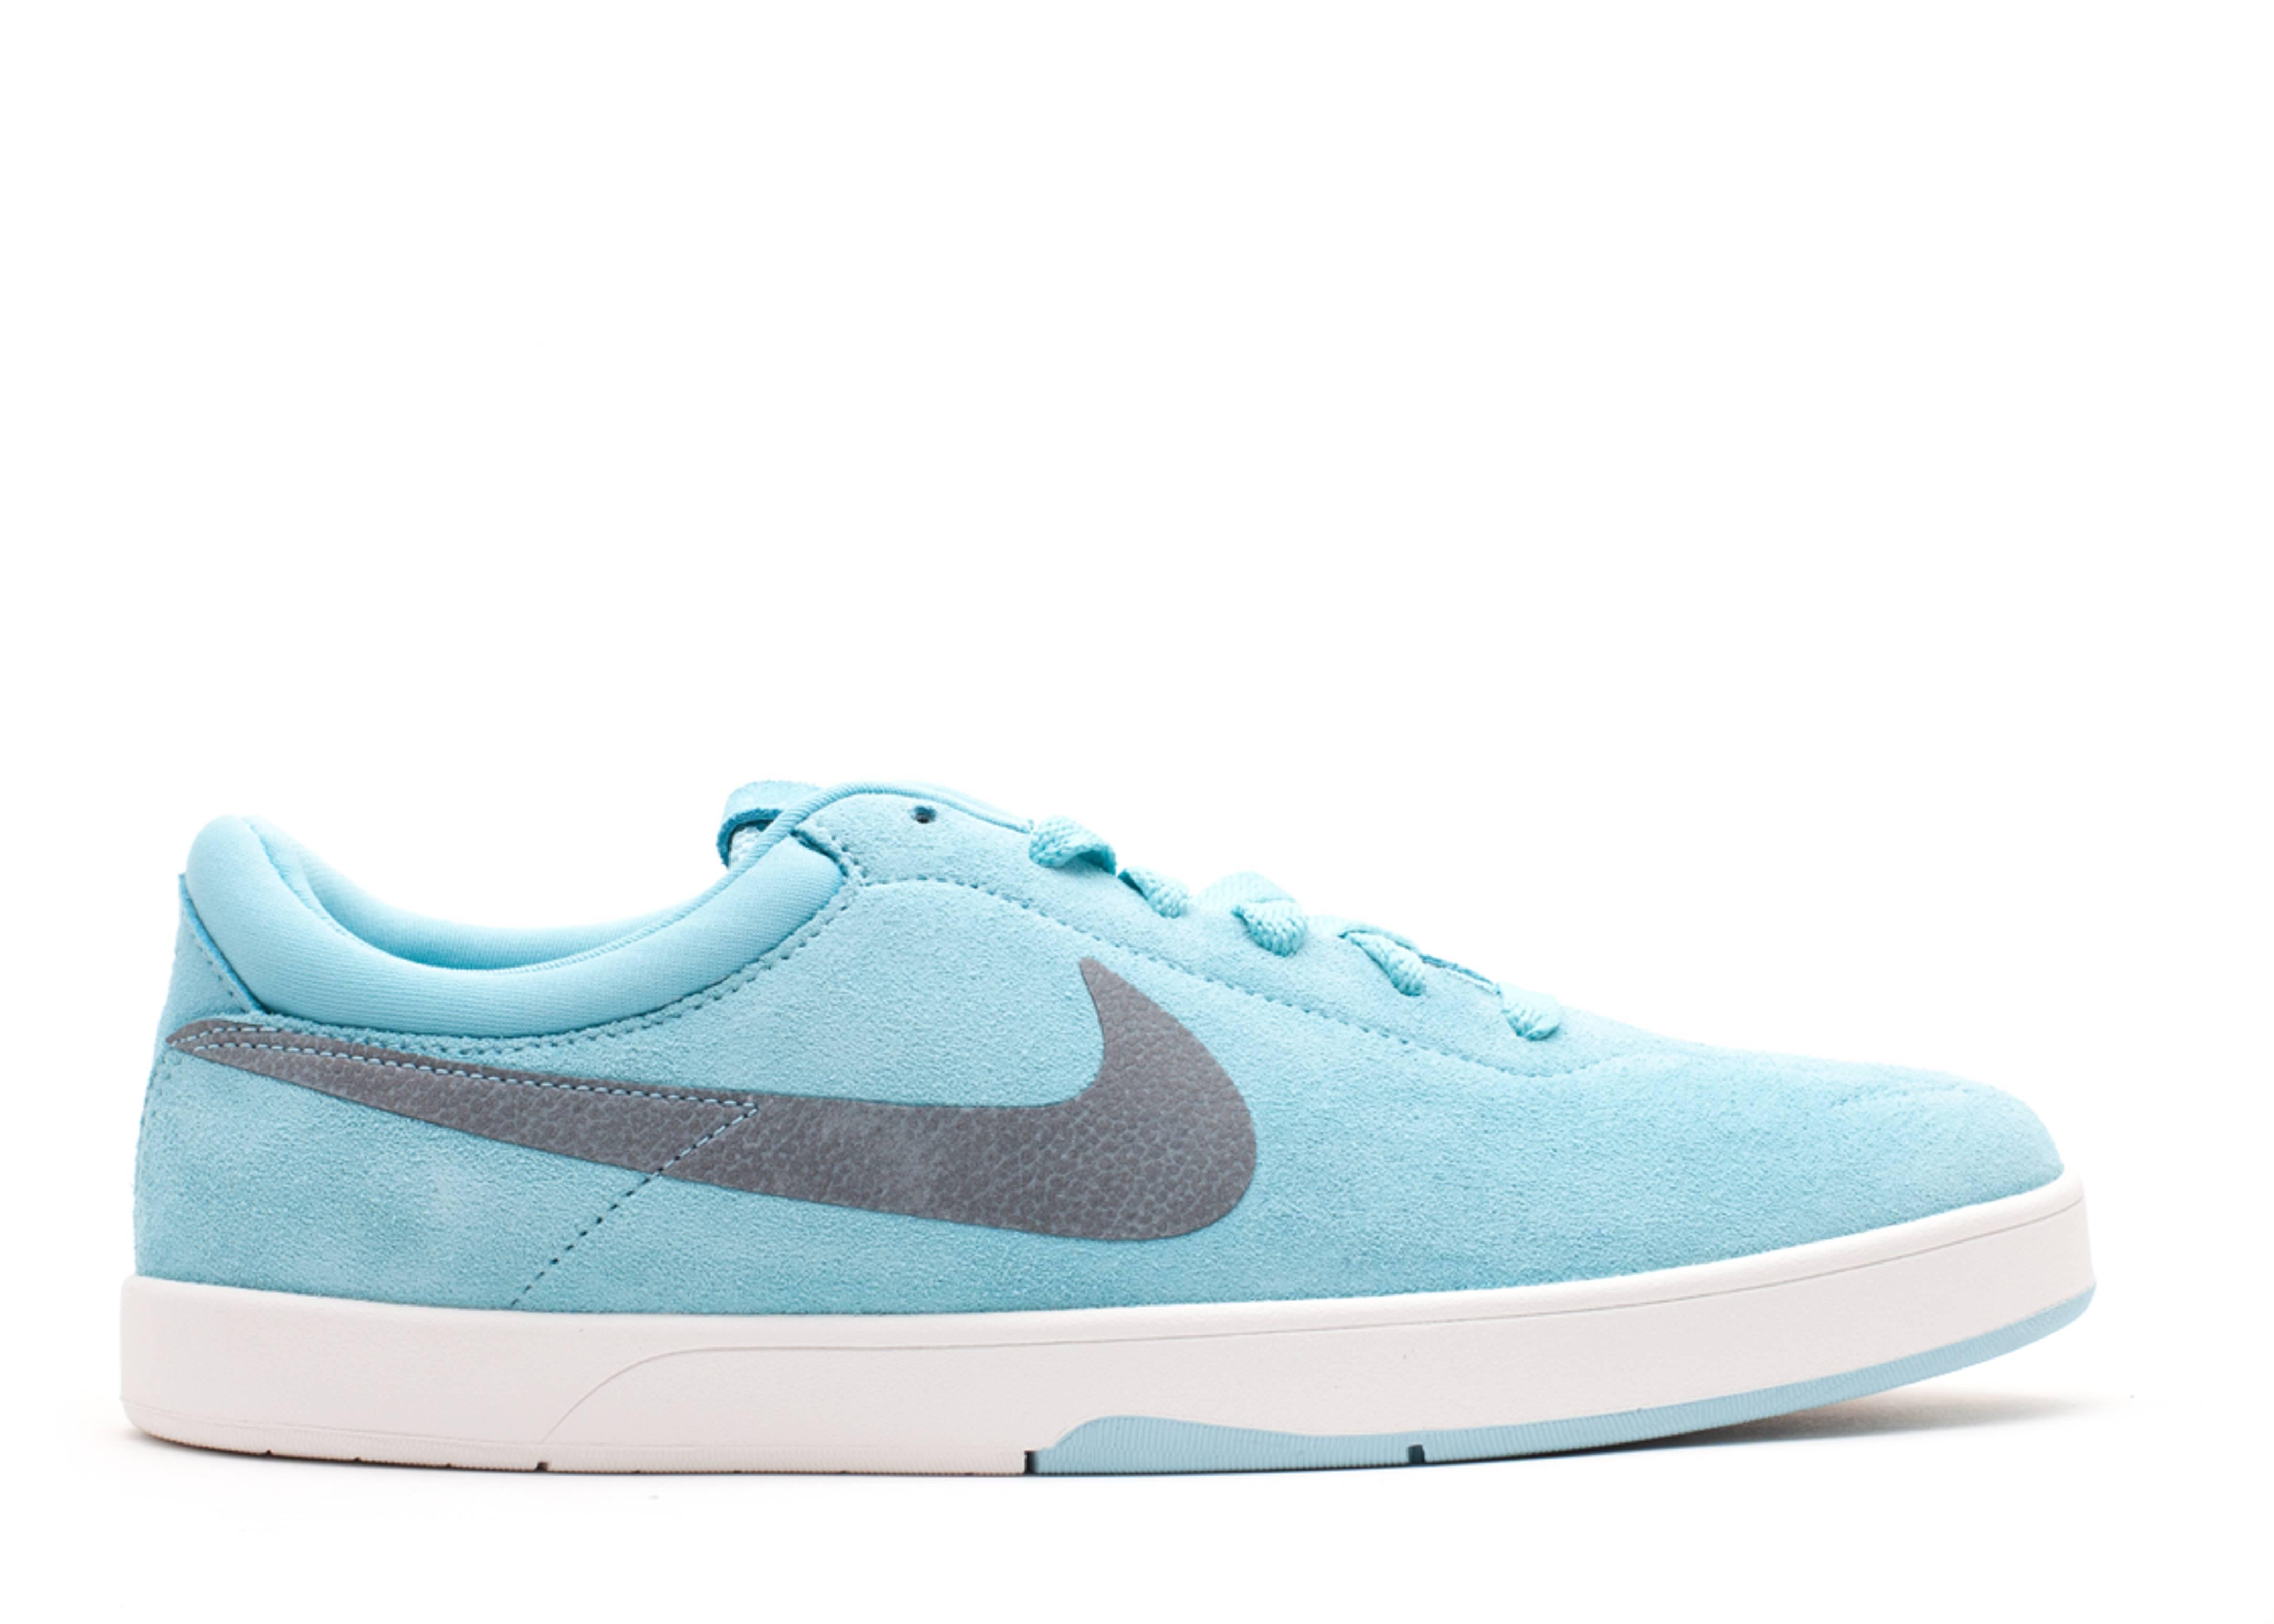 cheaper aaa3e 388ea Sb Eric Koston - Nike - 442476 401 - paradise aqua/slate ...